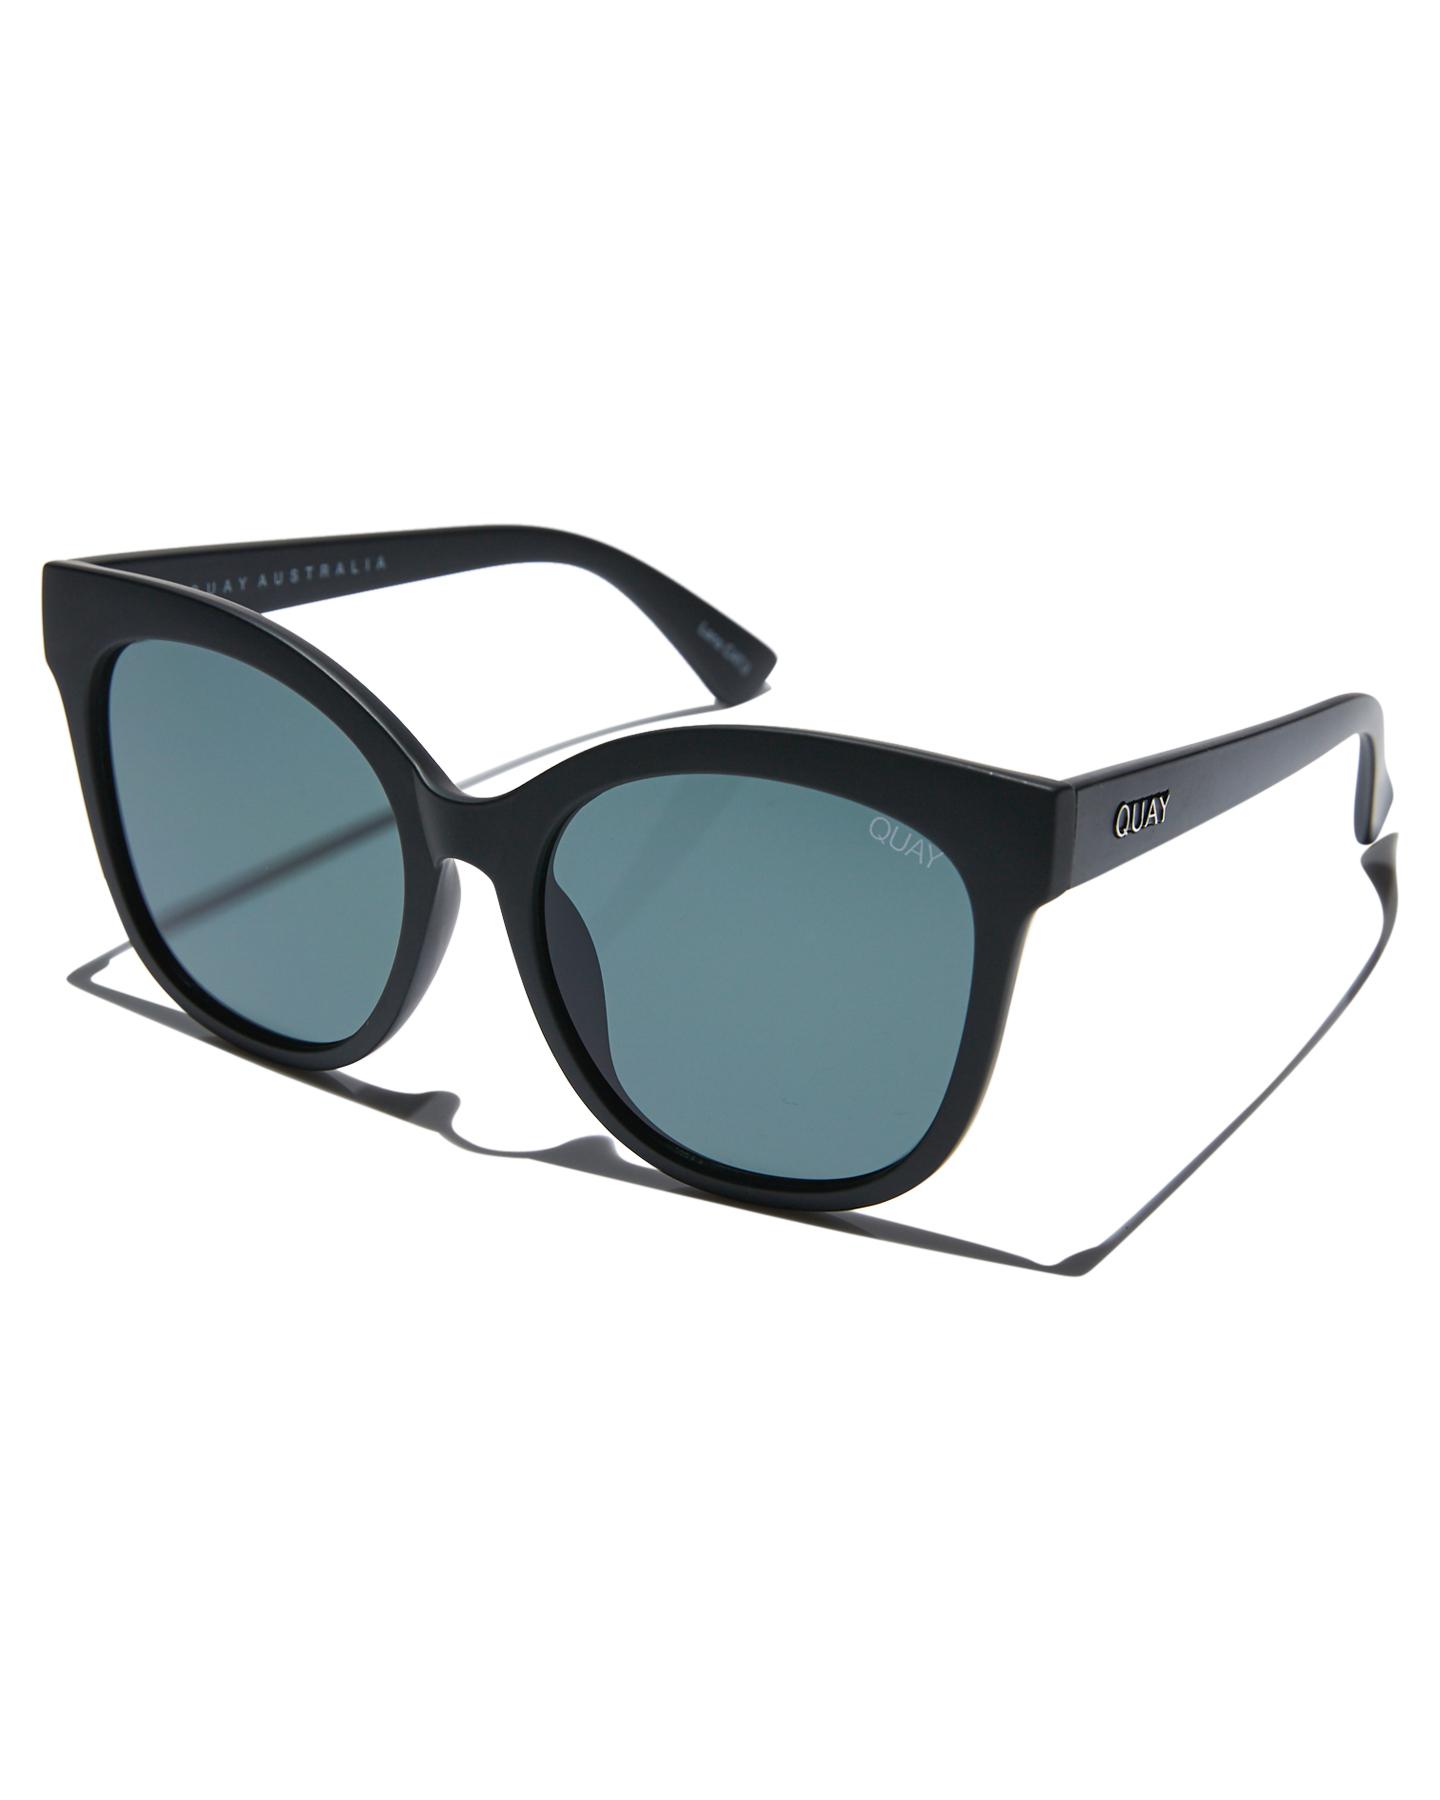 39c2ddd1f8 Quay Eyewear It S My Way Sunglasses Black Smoke Lens Womens ...